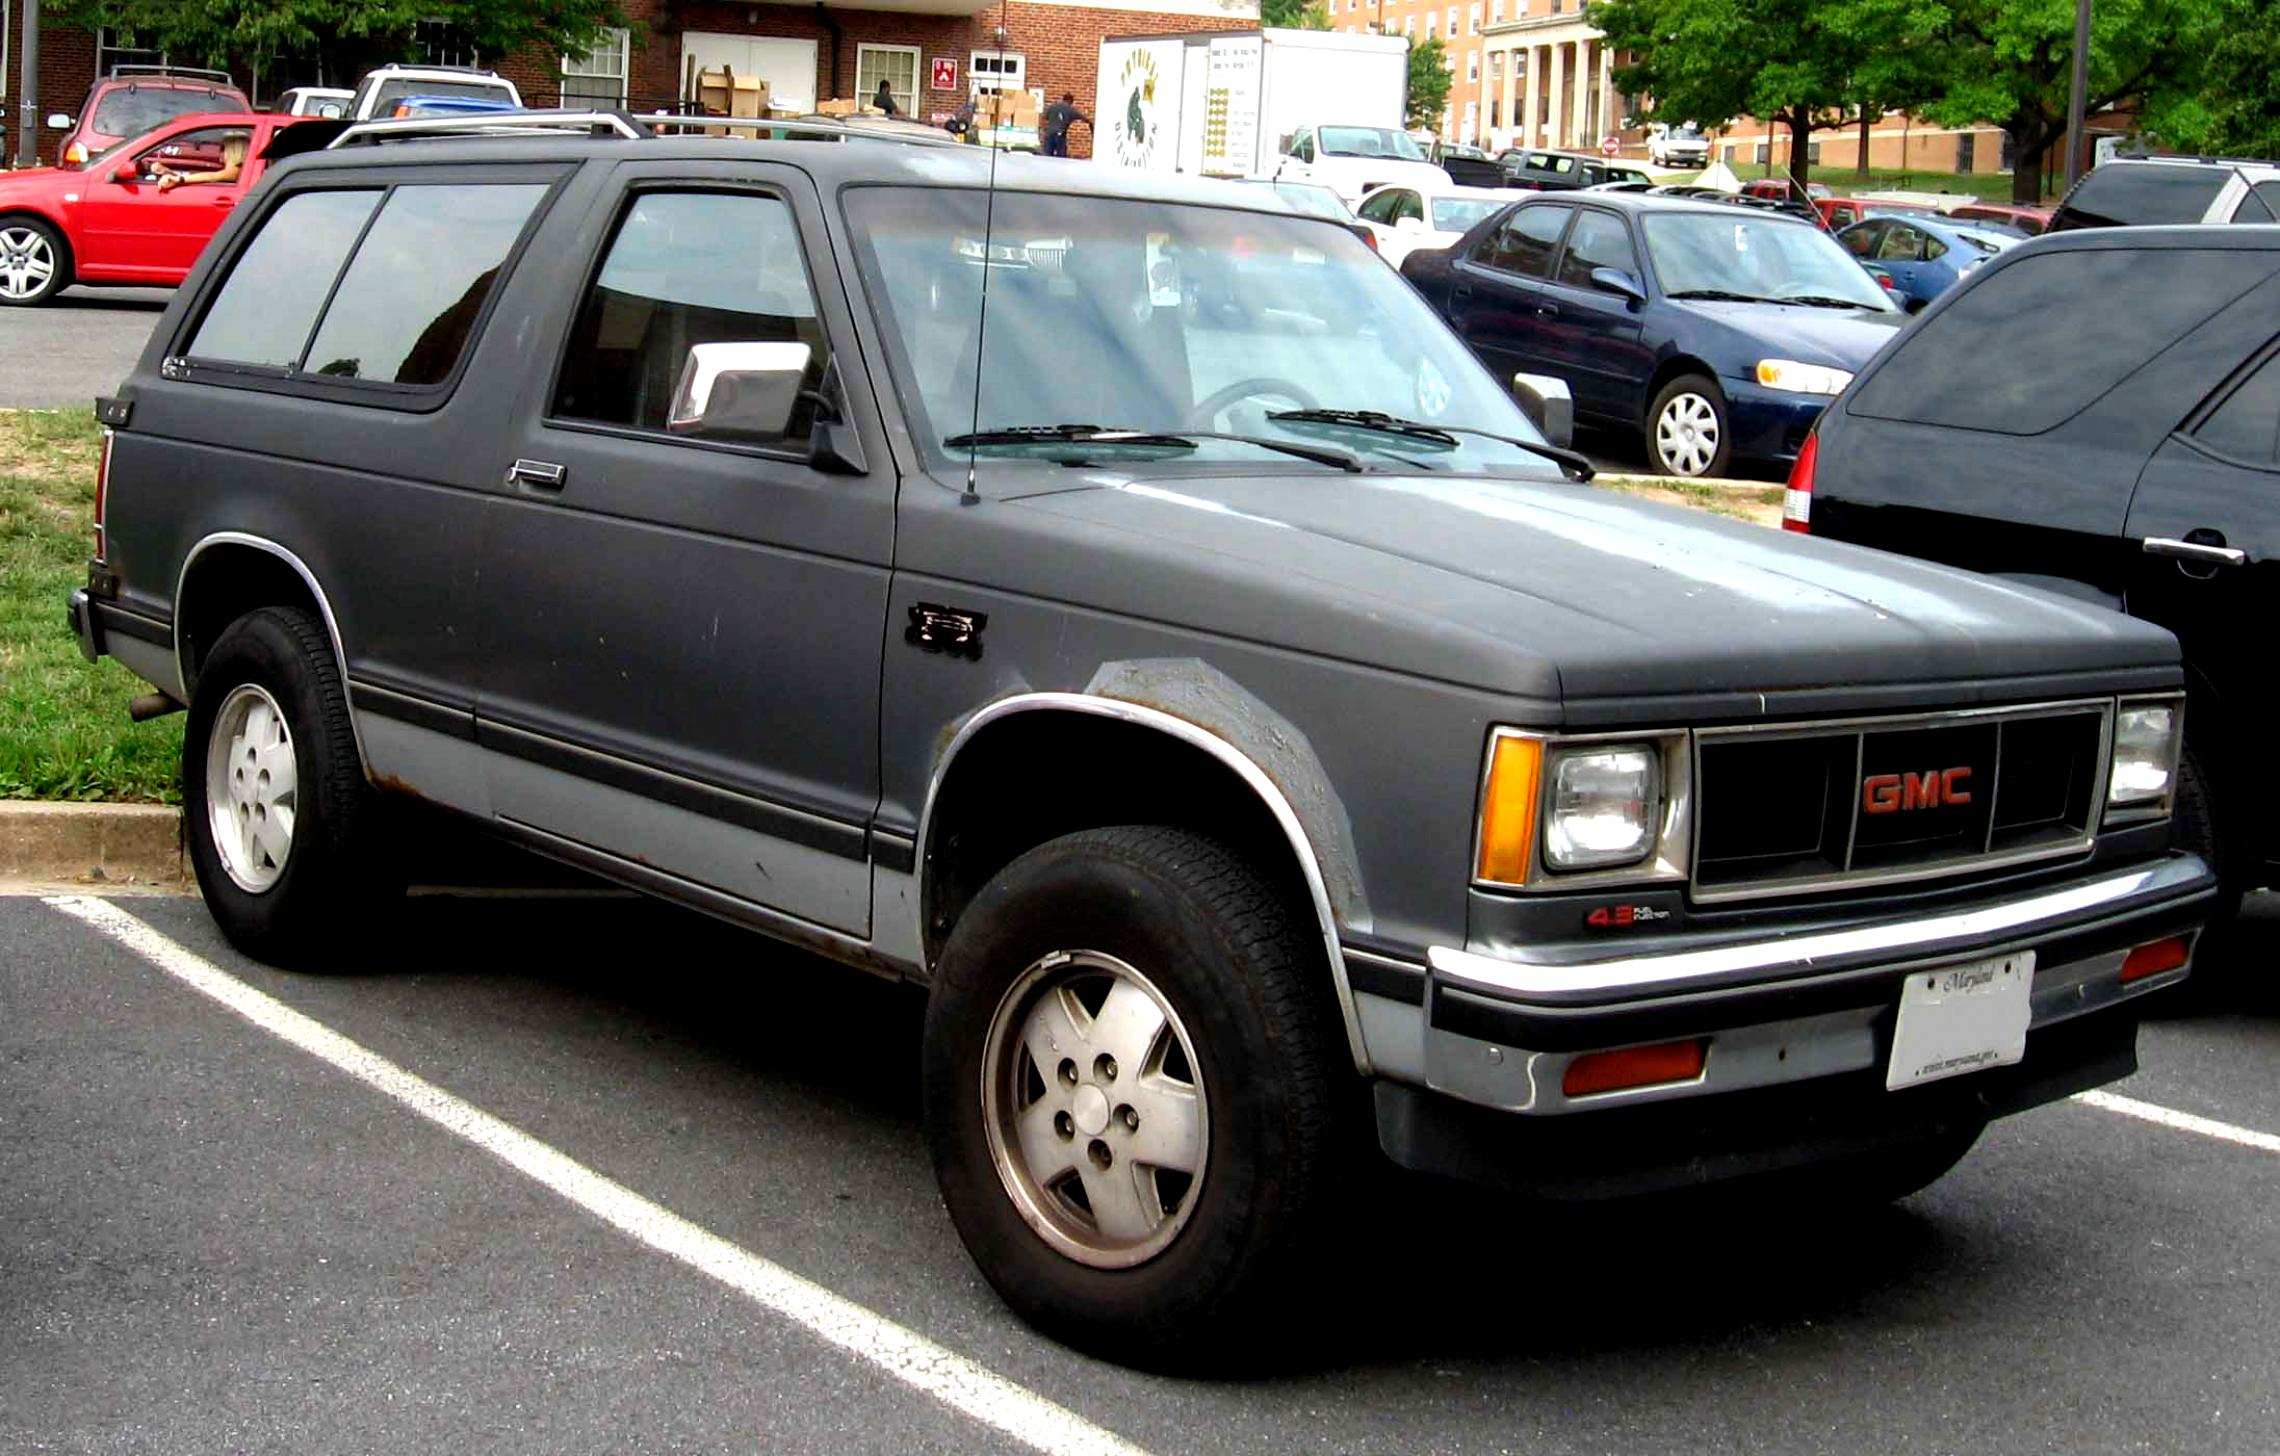 gmc jimmy 3 doors 1997 4